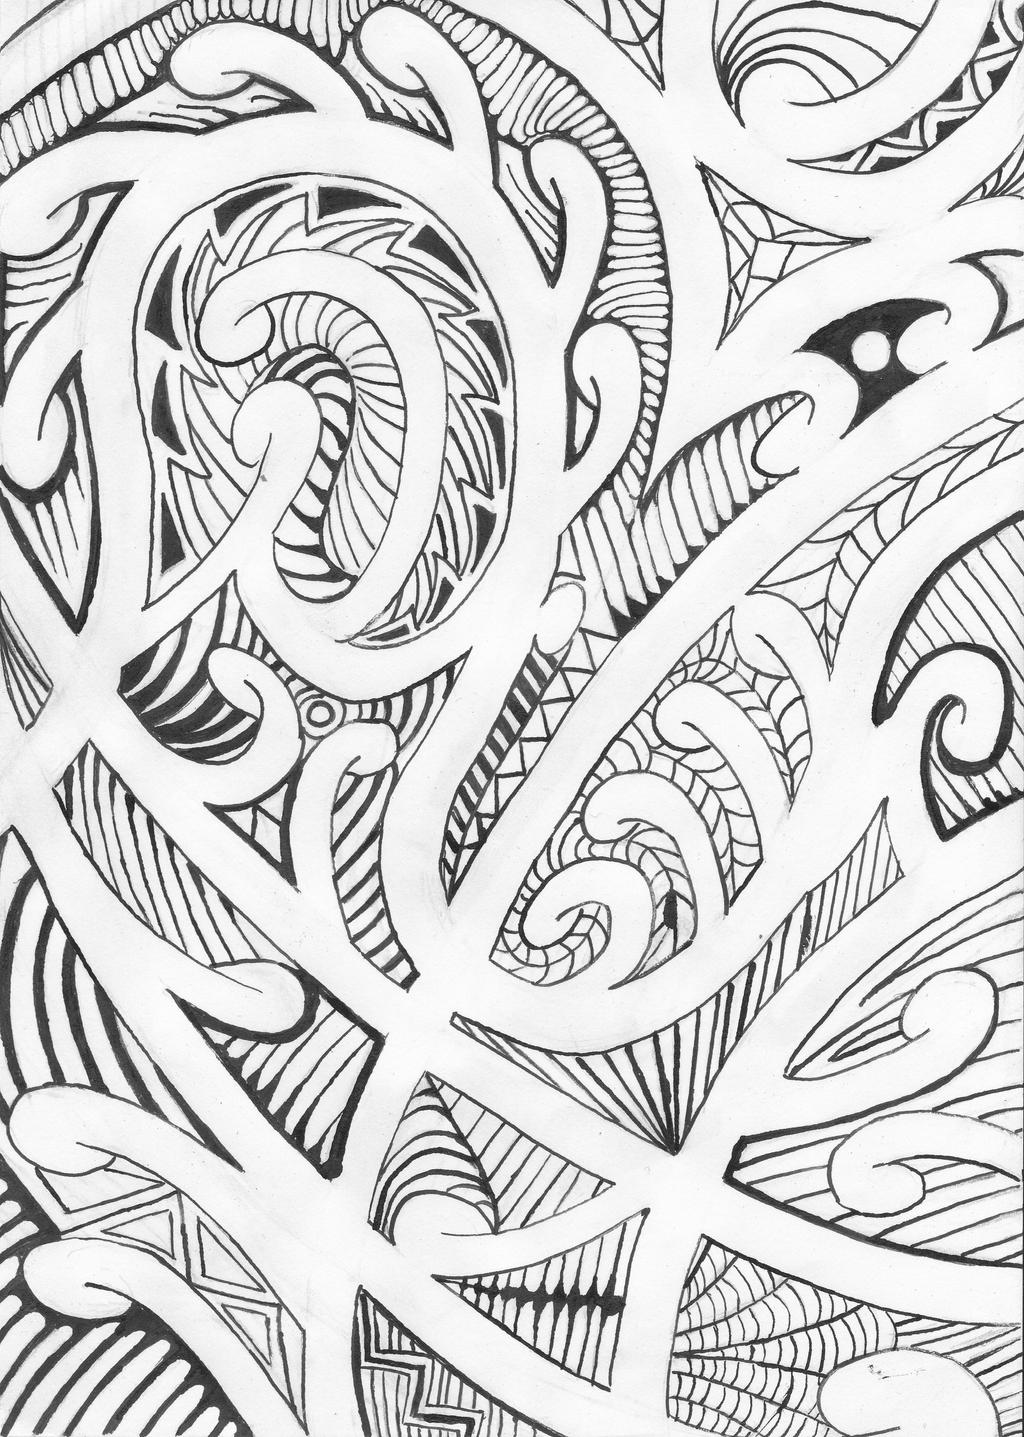 Maori Patterns and Designs